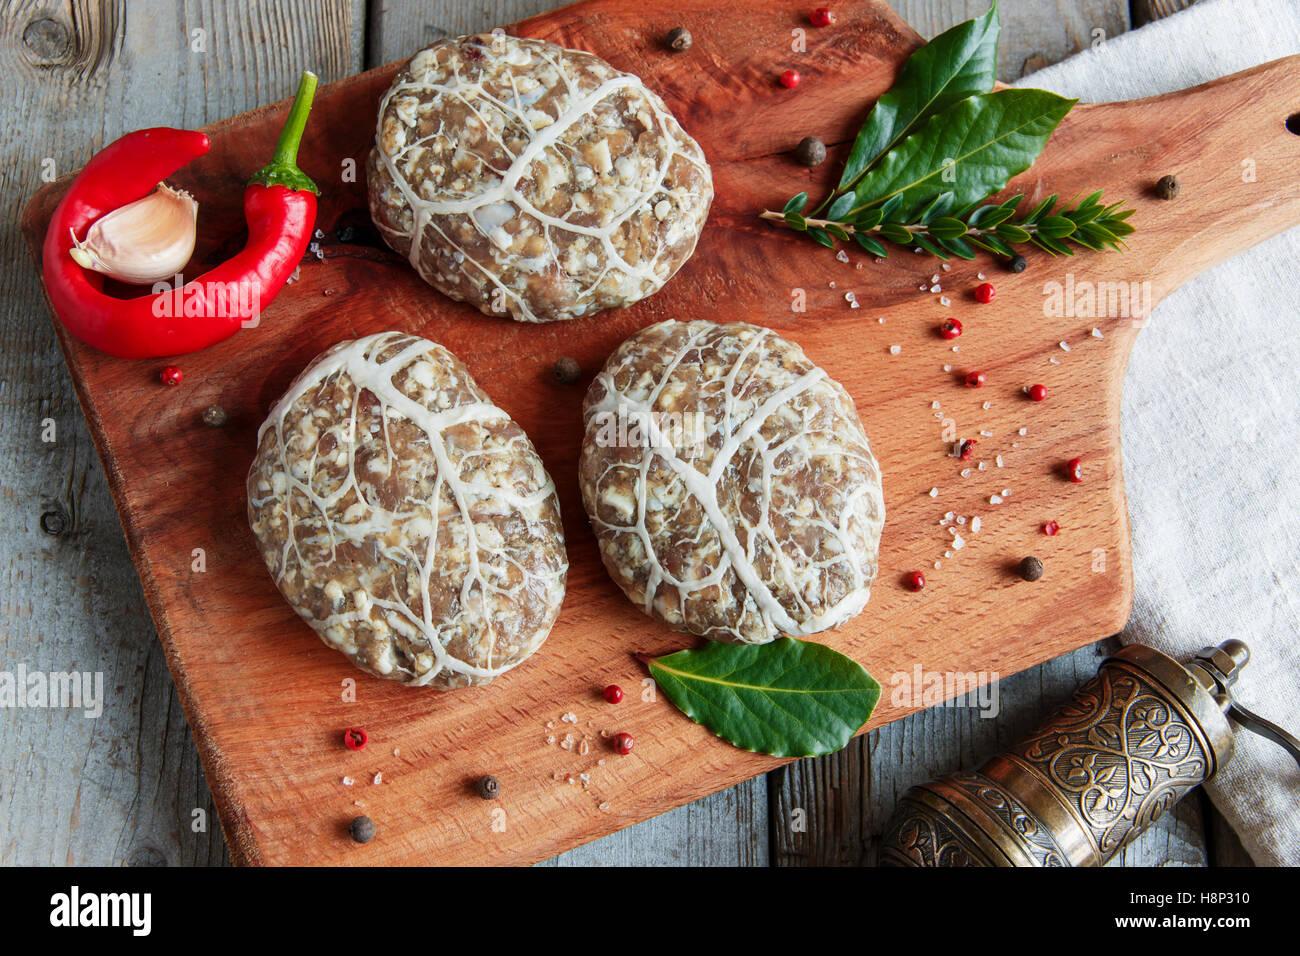 Caul-Fat Meatballs raw burger cutlet handmade on desk - Stock Image